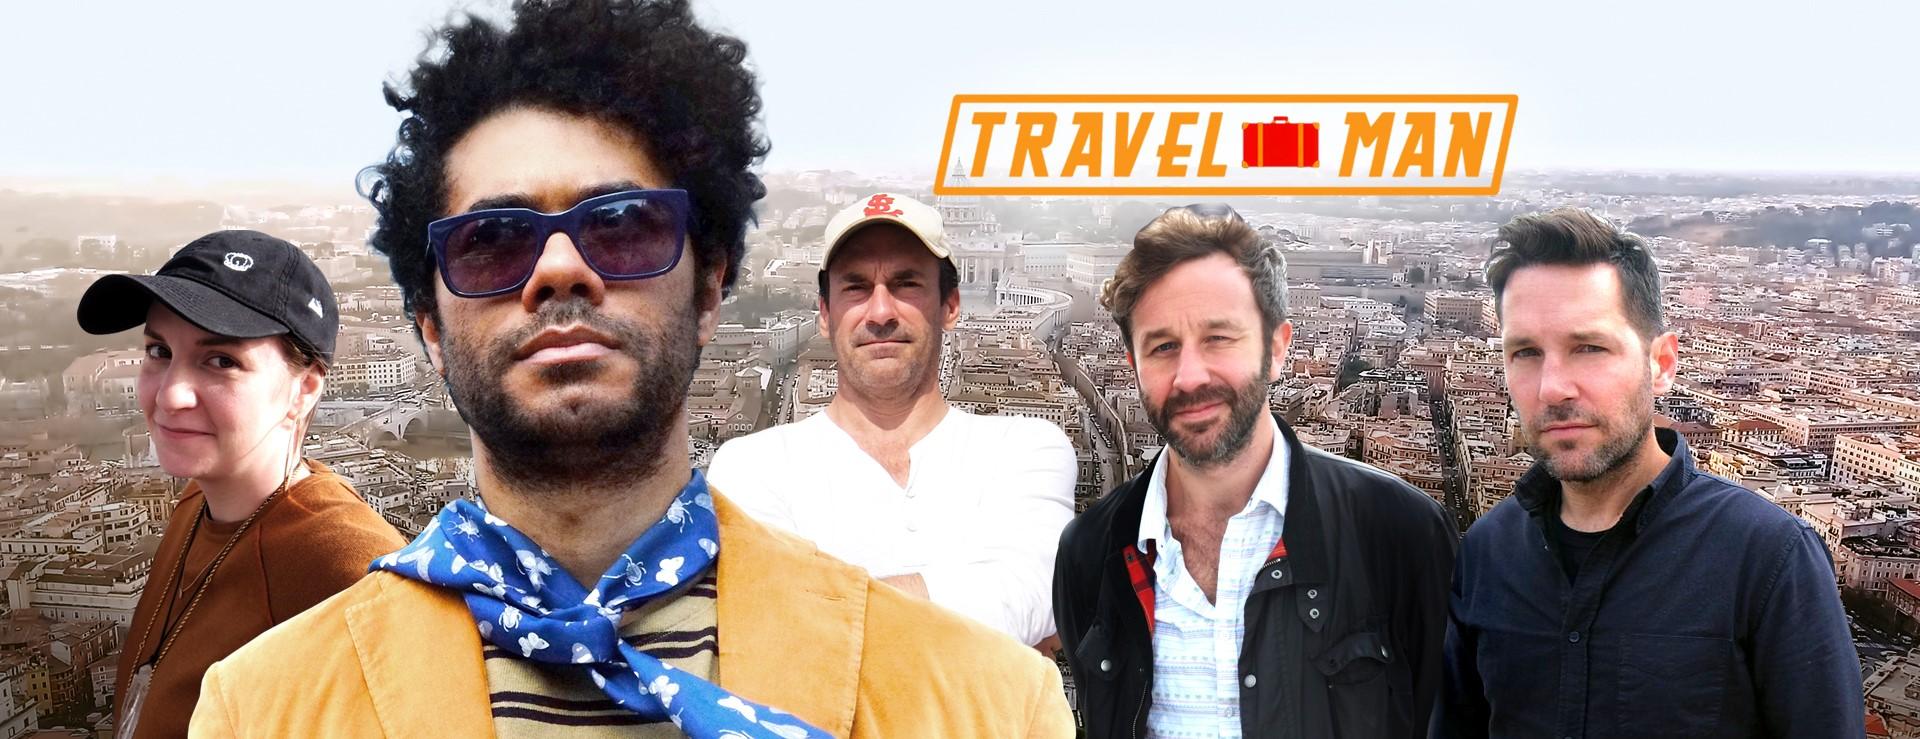 travel-man-tv-show